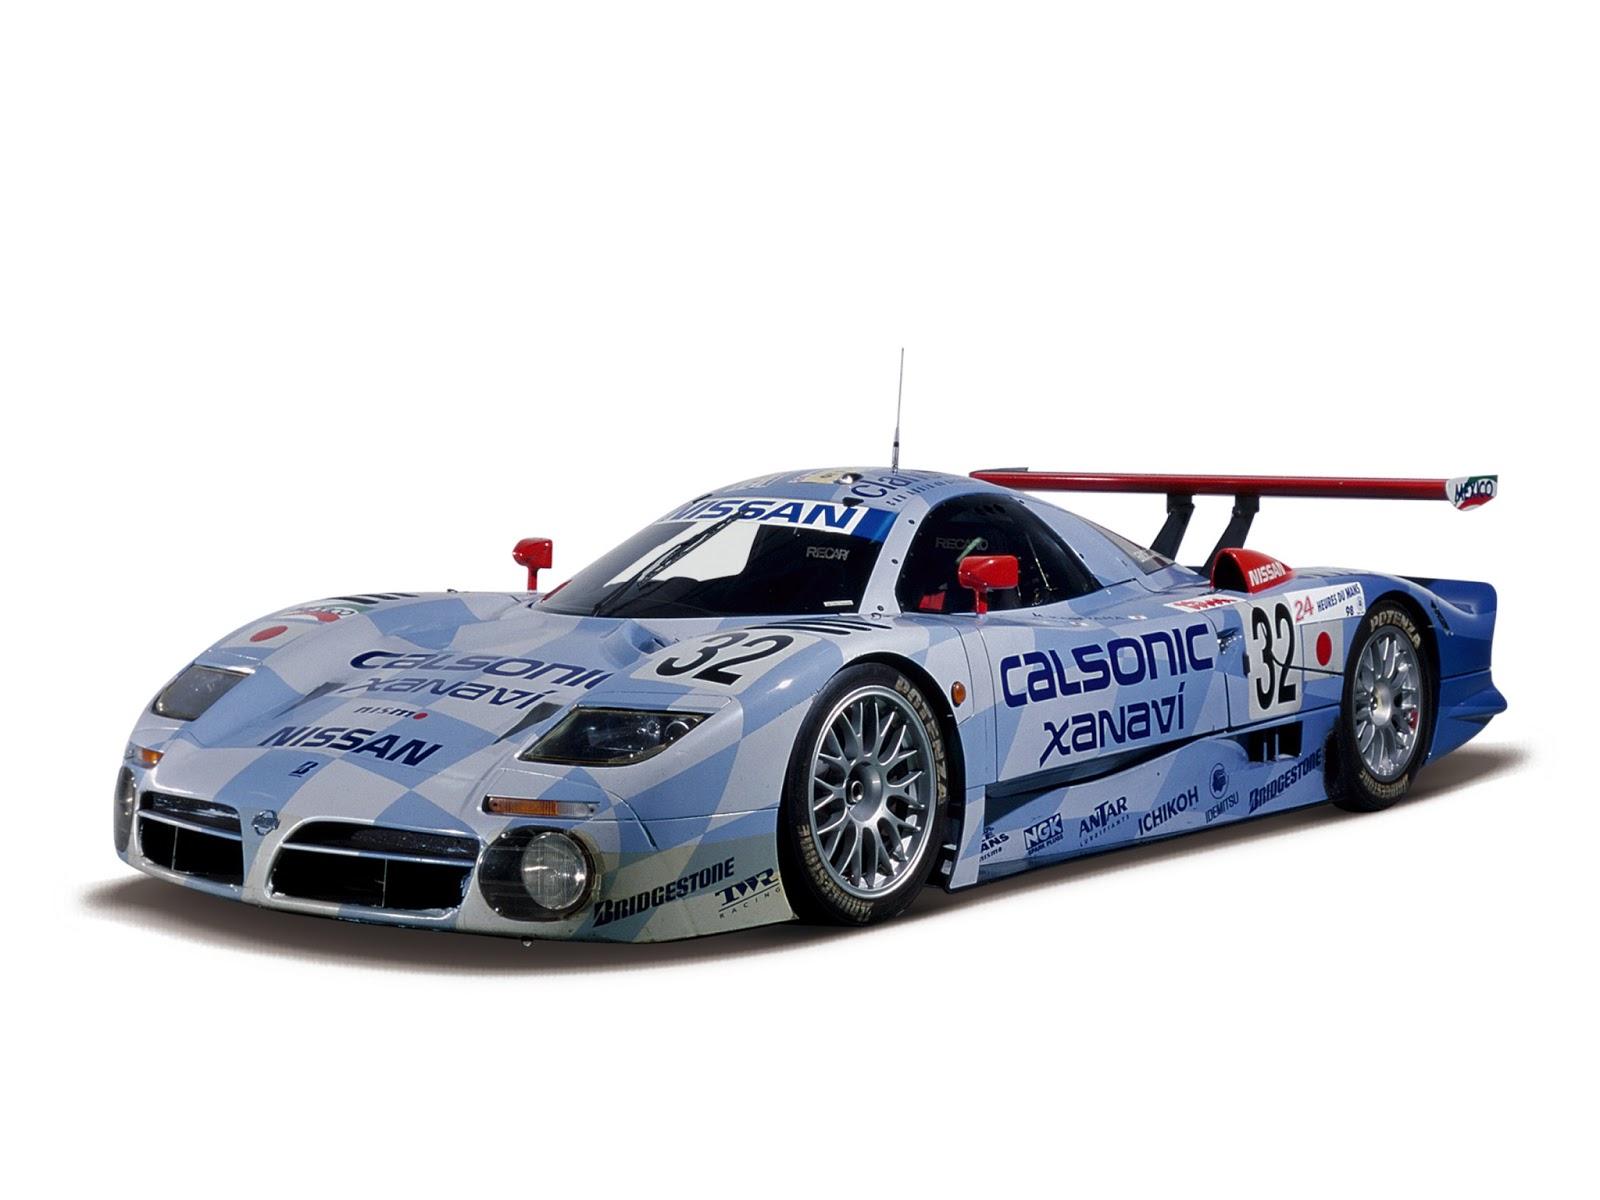 Nissan Announce Electric Le Mans Racer For 2017